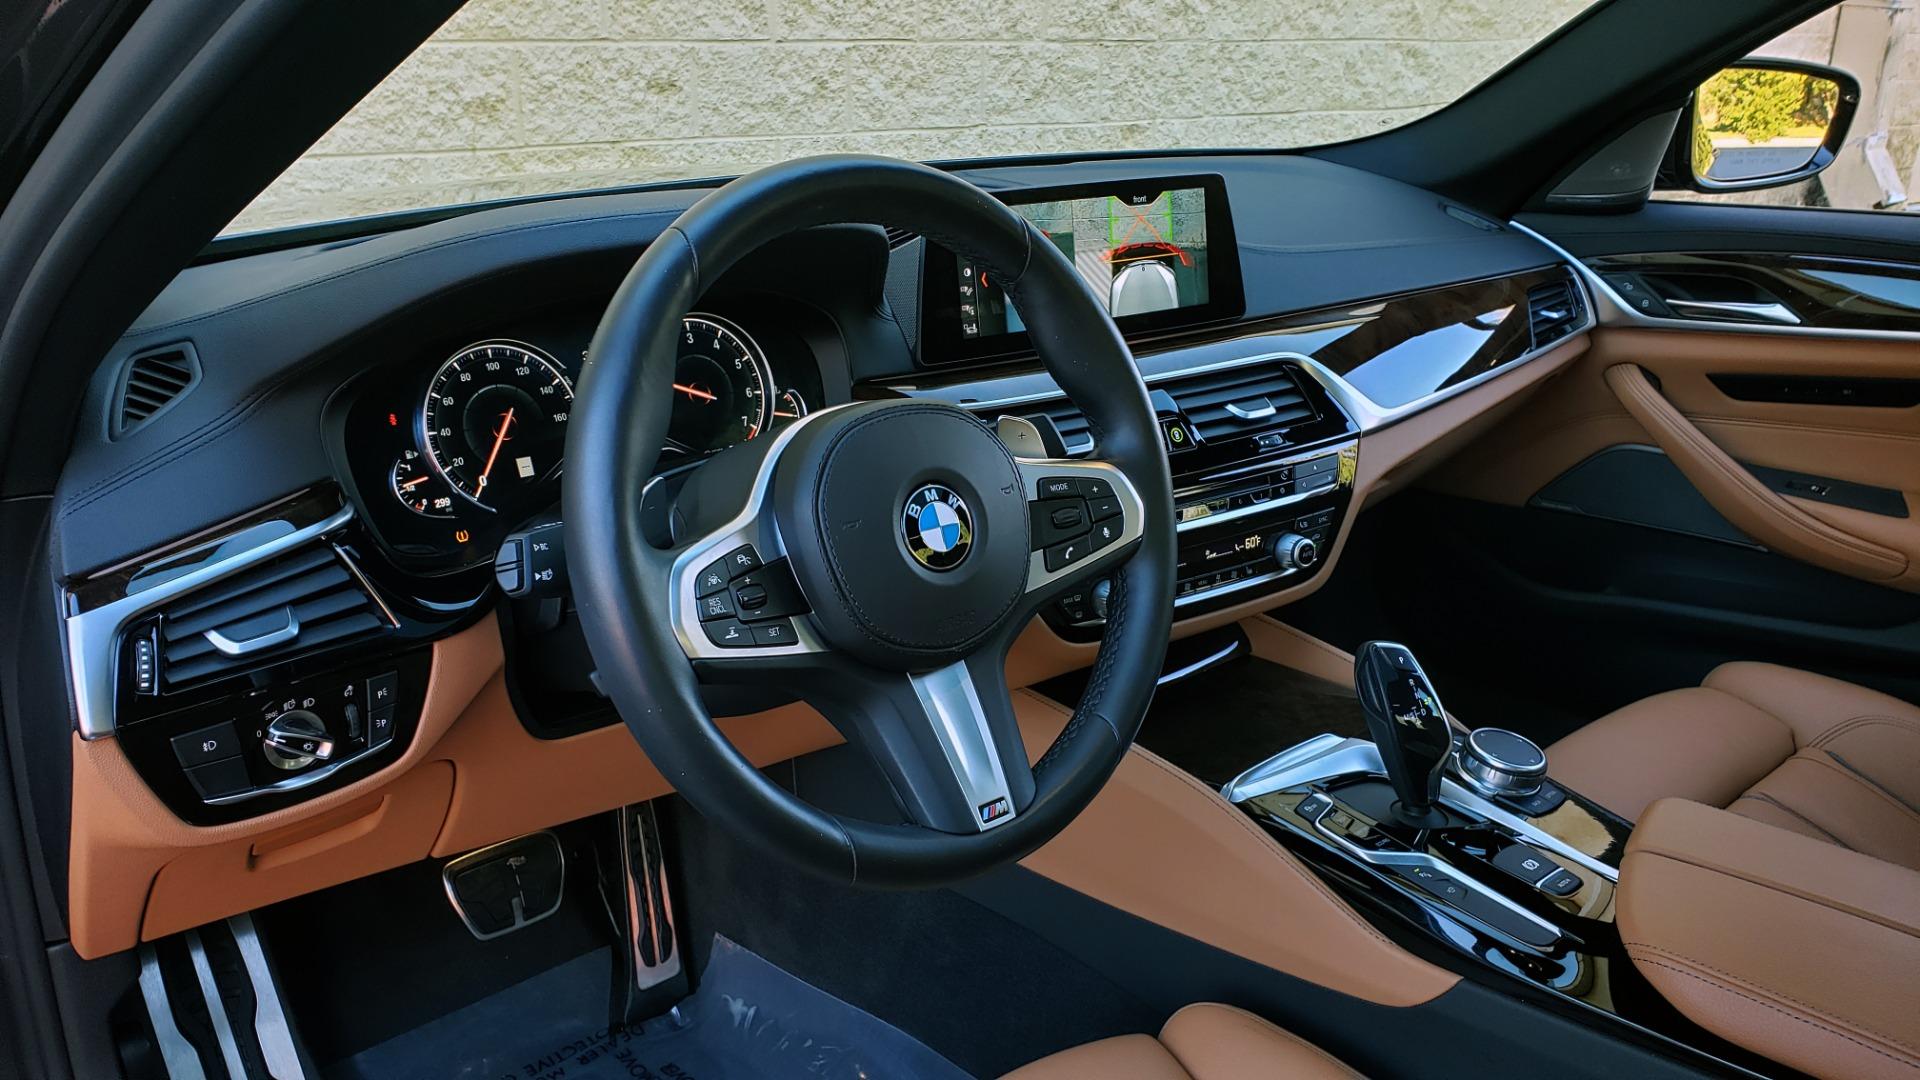 Used 2018 BMW 5 SERIES 540I M-SPORT / DRVR ASST / EXEC PKG / NAV / SUNROOF / HUD / REARVIEW for sale Sold at Formula Imports in Charlotte NC 28227 37